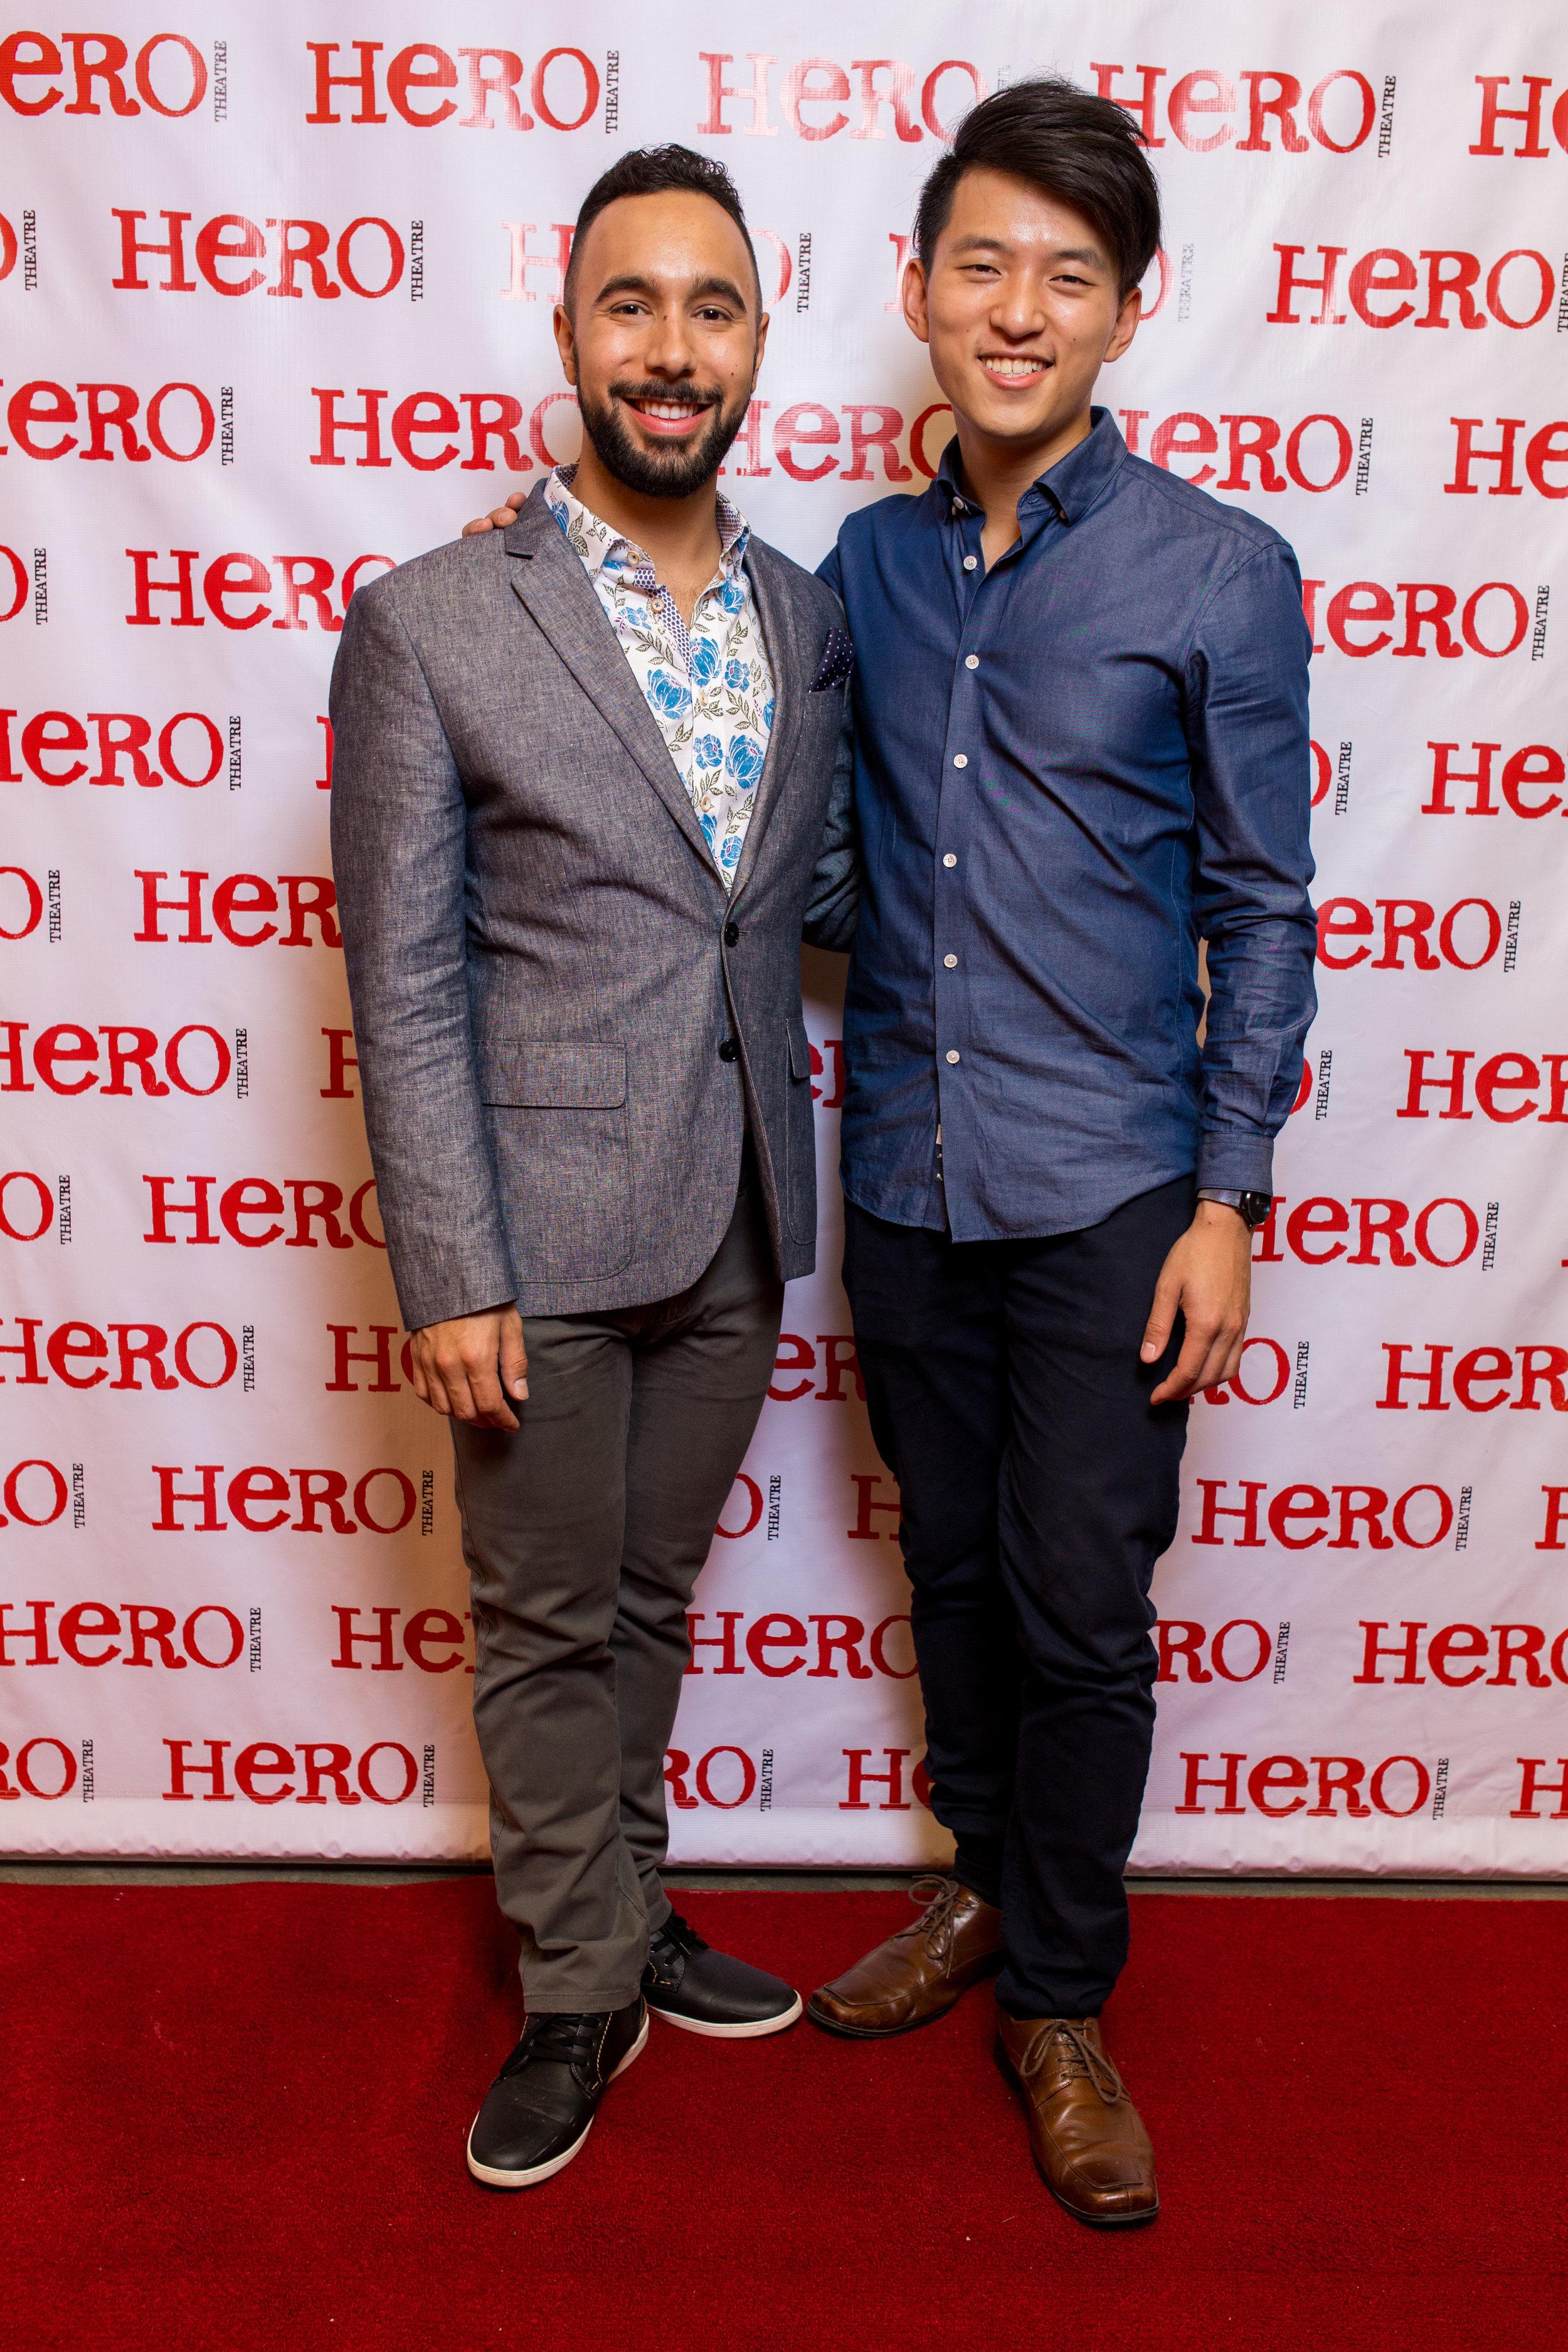 Hero-Theater-Final_17-06-11-0390.jpg